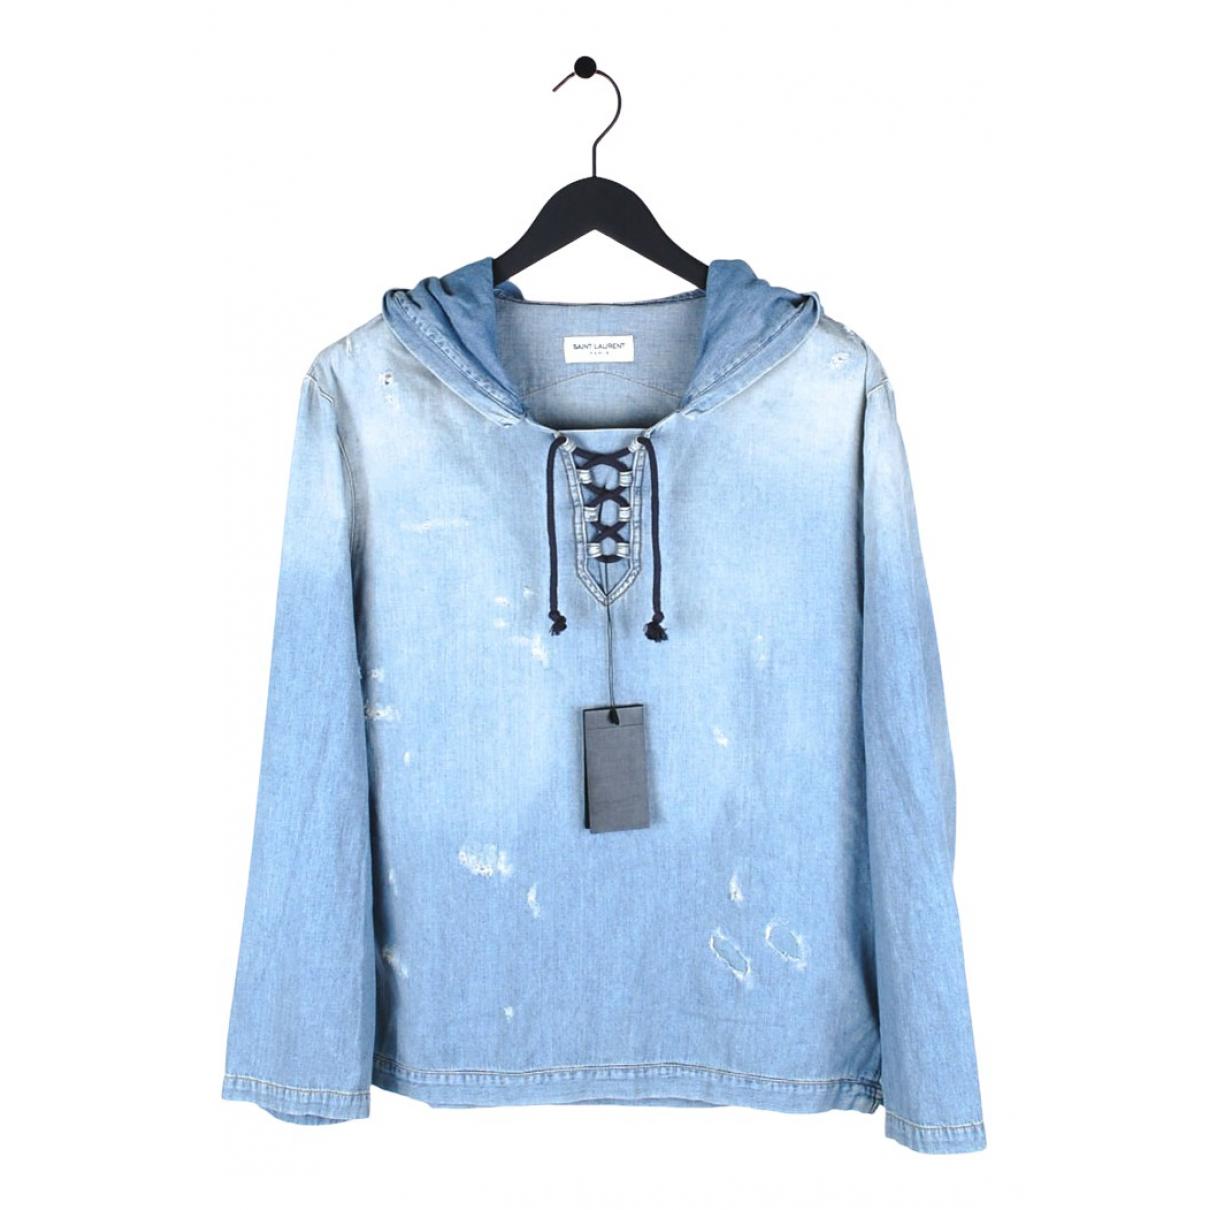 Saint Laurent N Blue Cotton Knitwear & Sweatshirts for Men M International